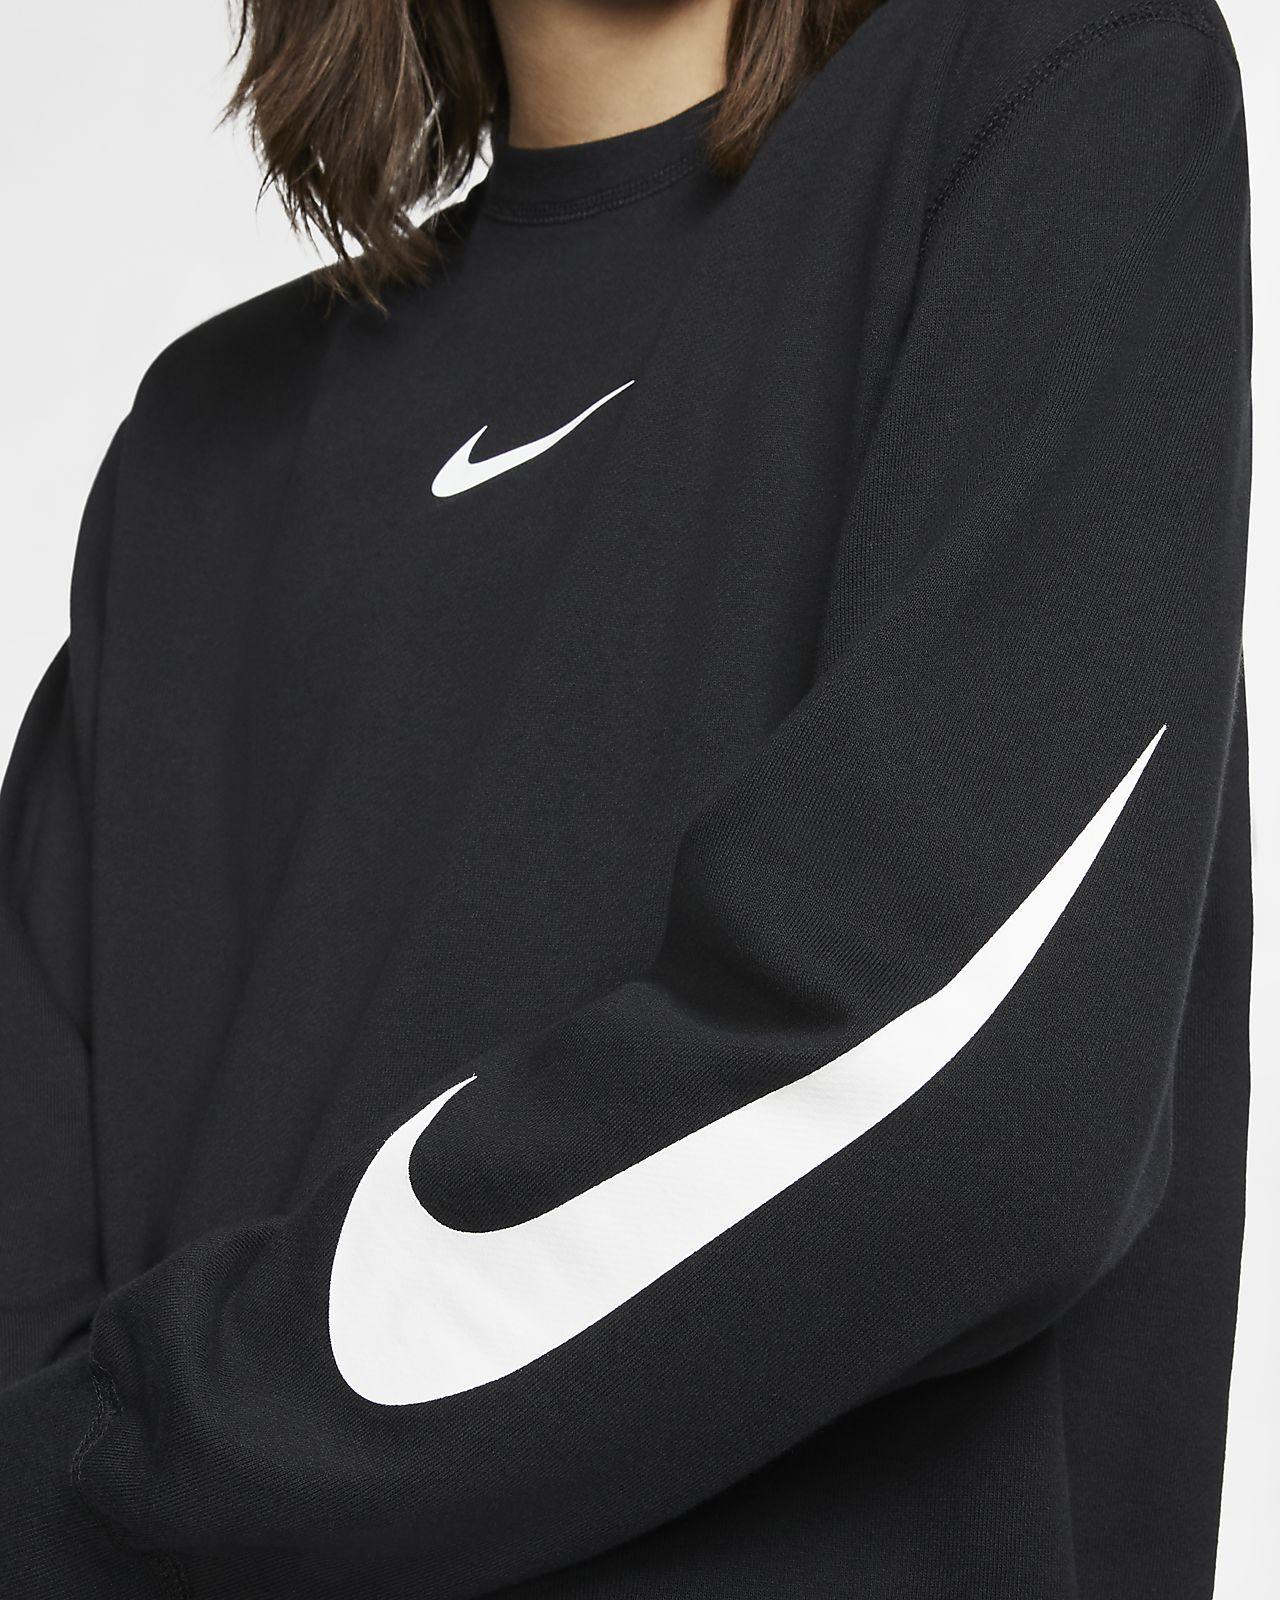 67598149 Nike Sportswear Swoosh Long-Sleeve French Terry Crew. Nike.com NL